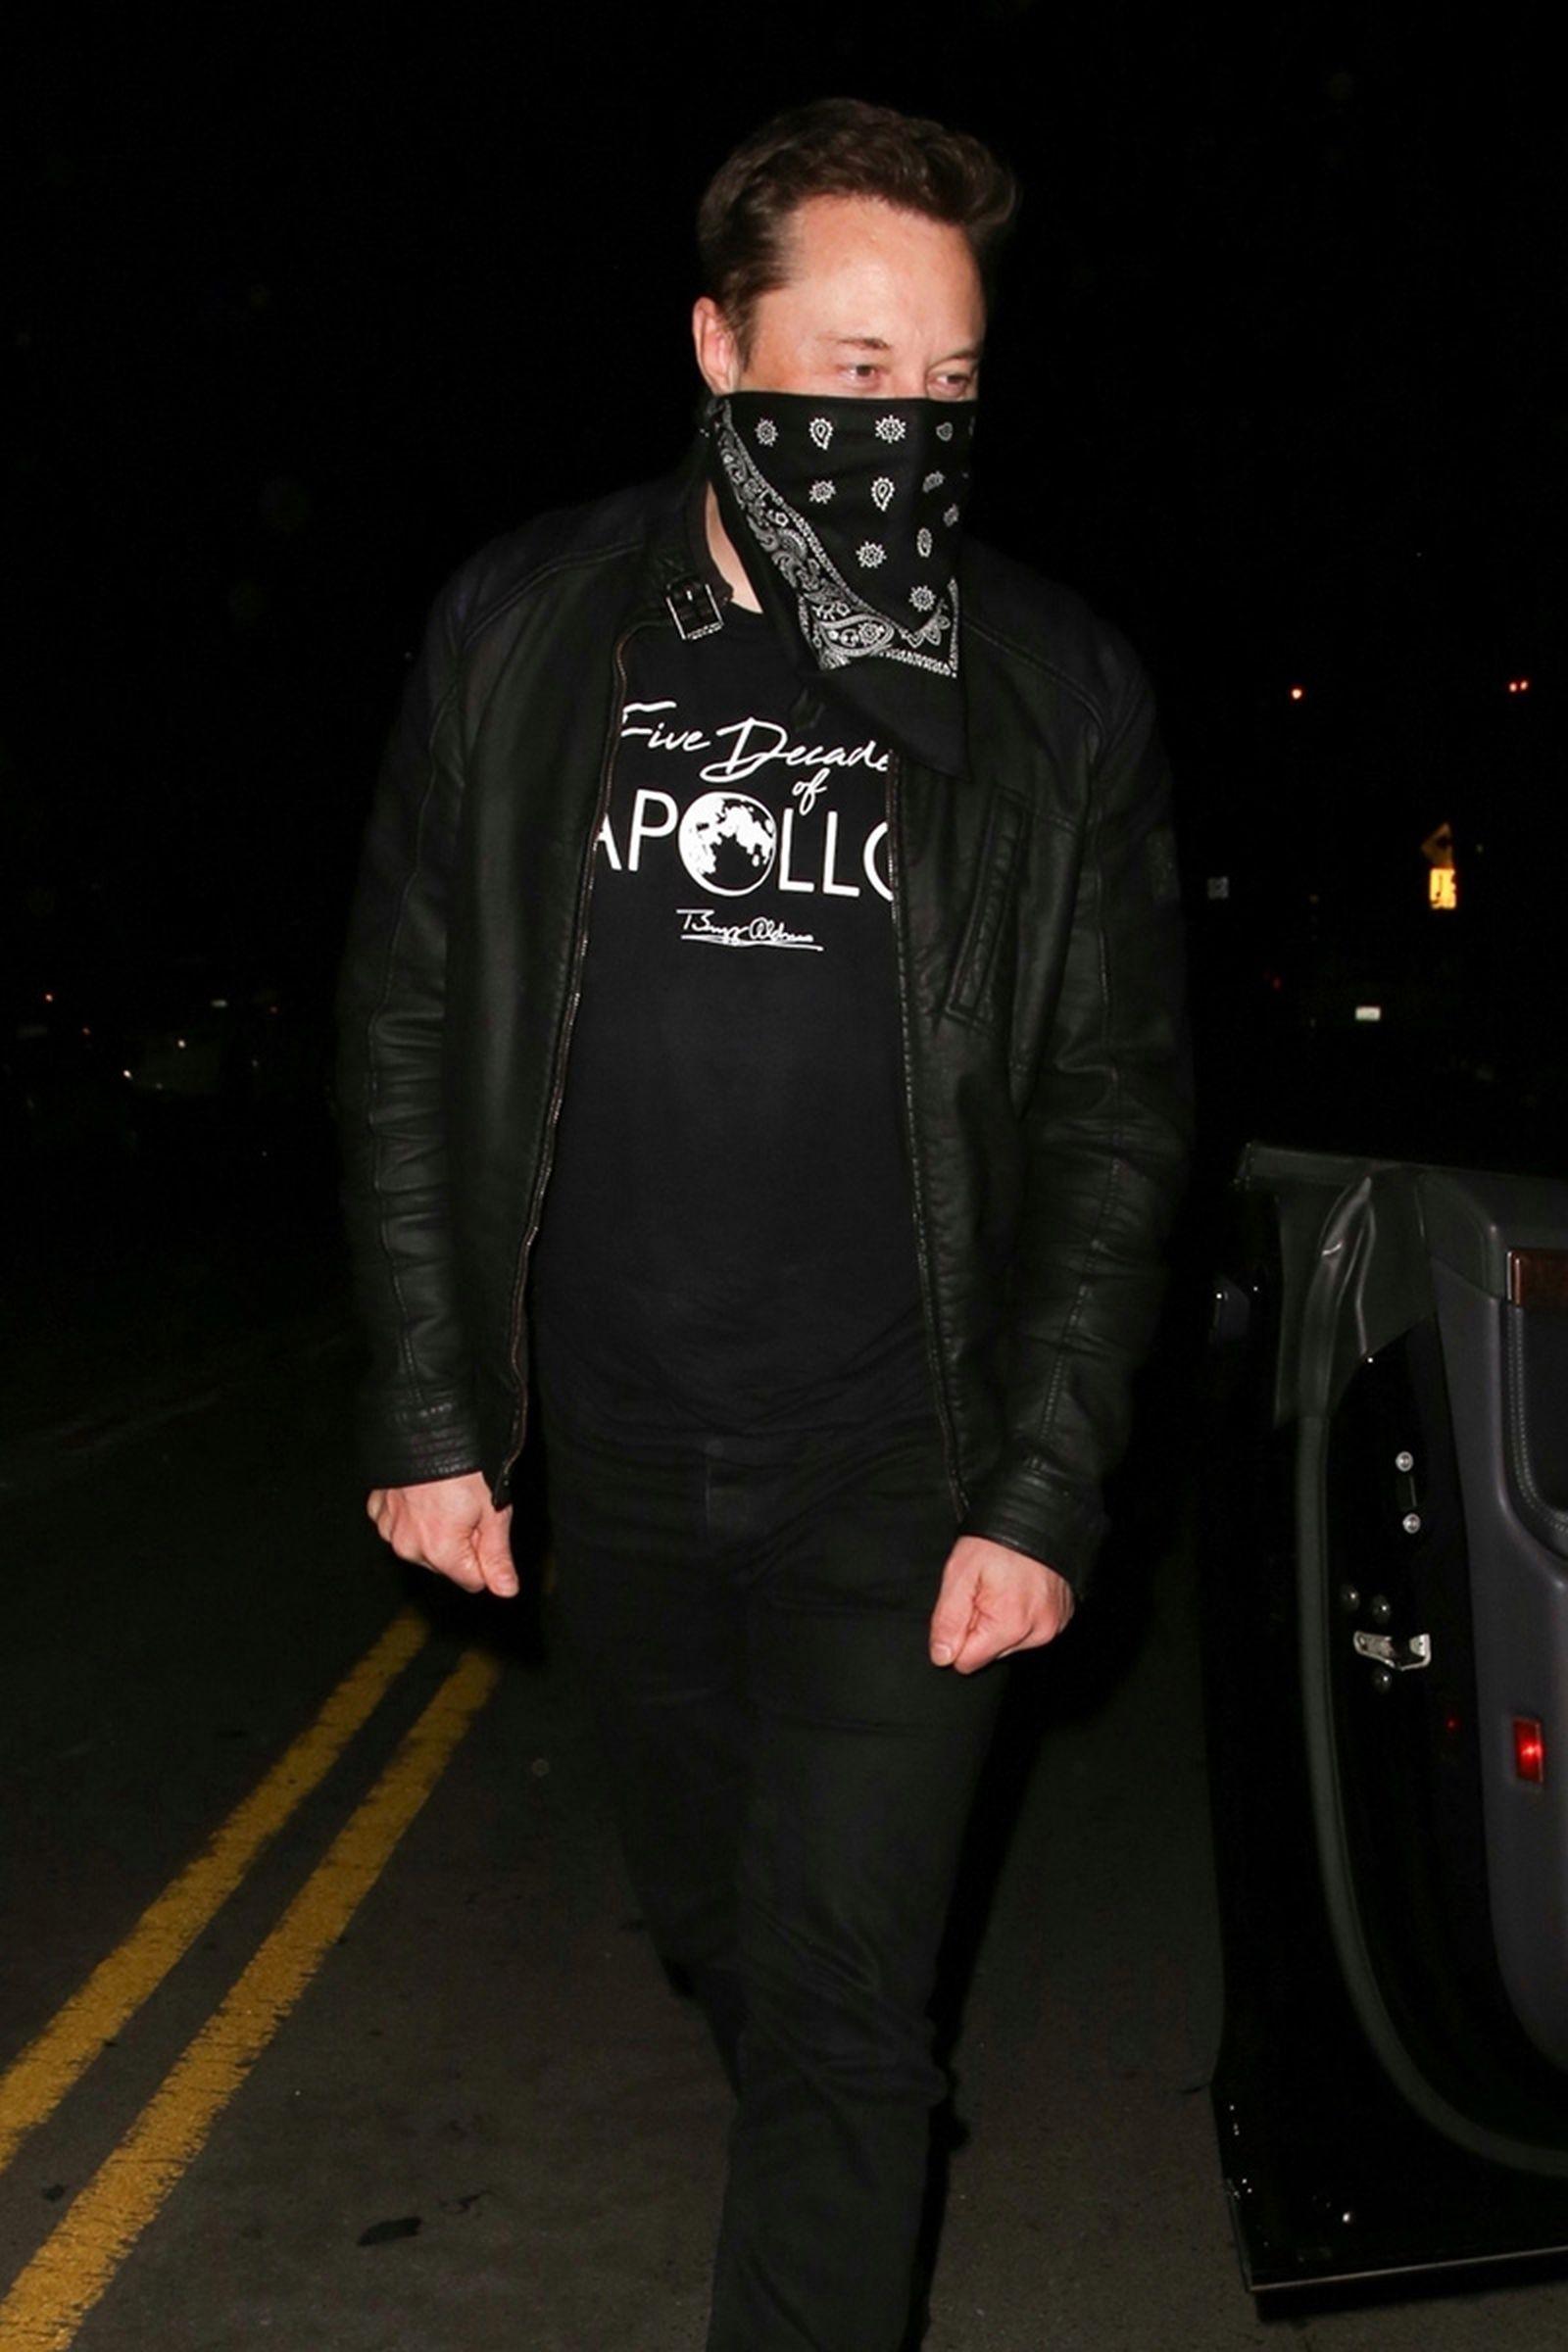 Elon Musk wearing a bandana